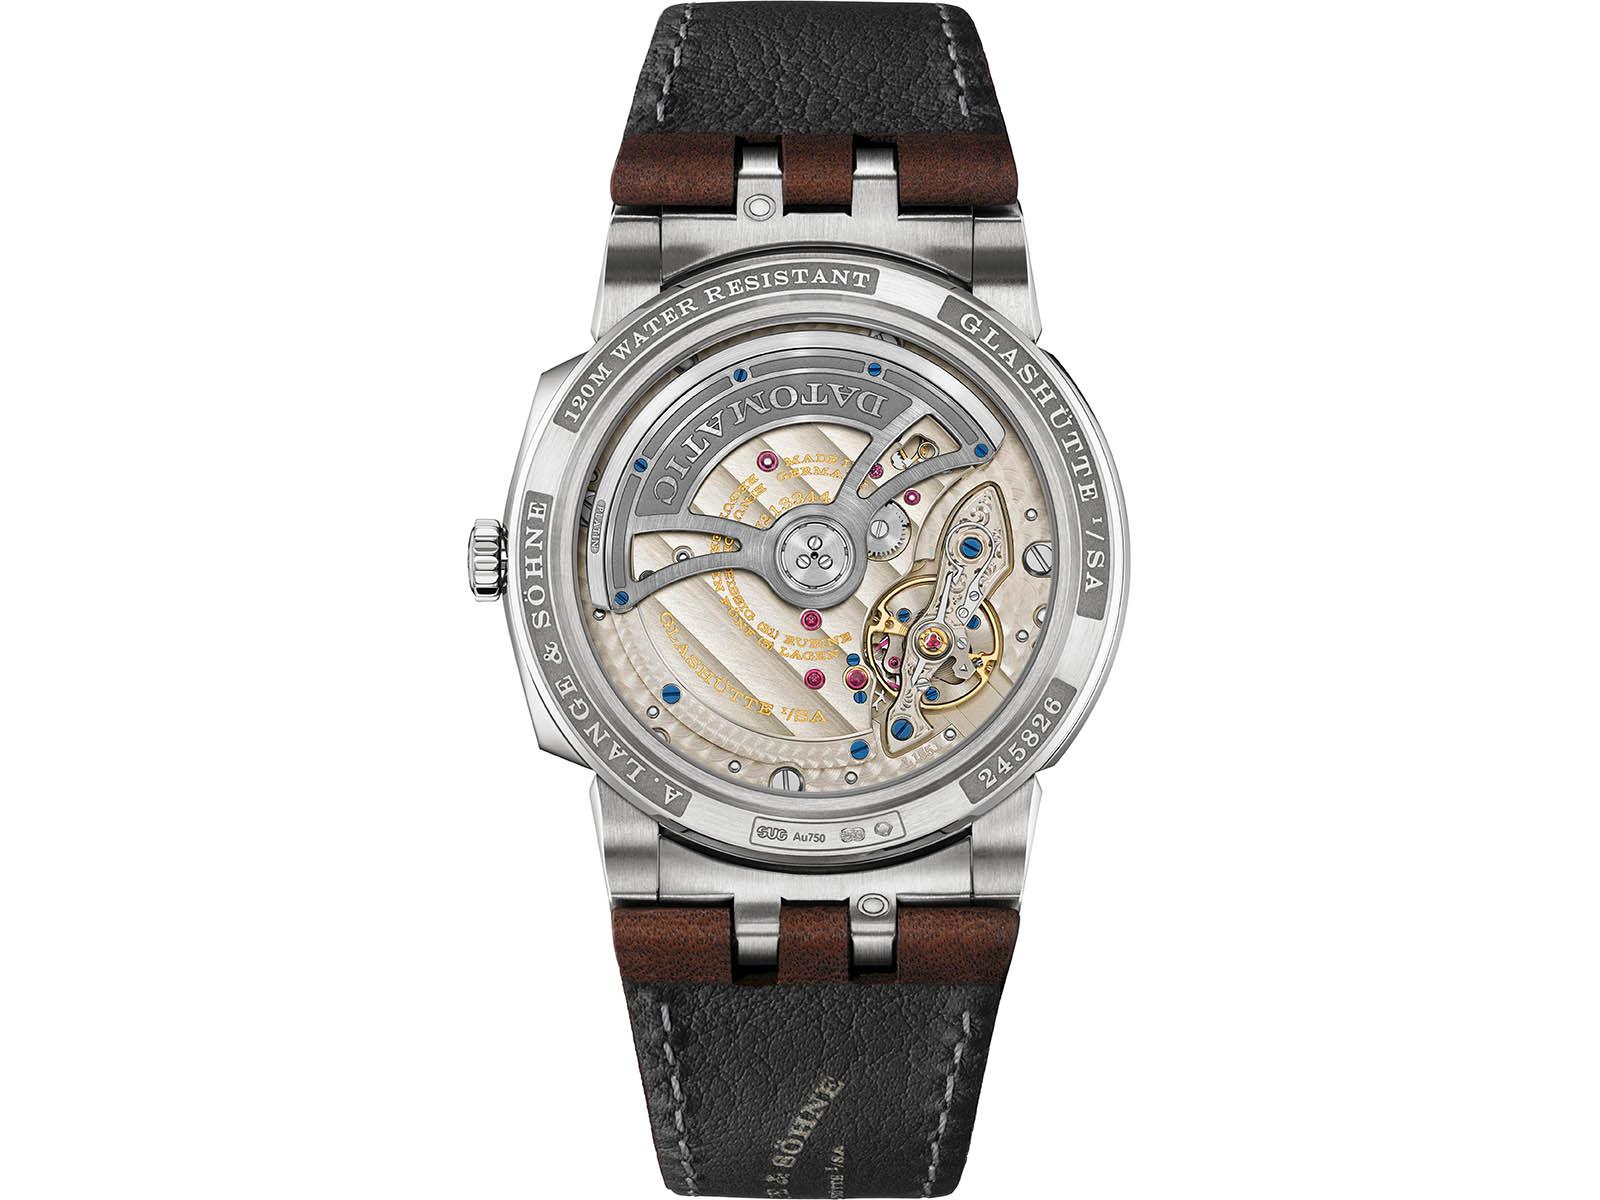 363-038-a-lange-sohne-odysseus-watch-wonders-2020-4.jpg